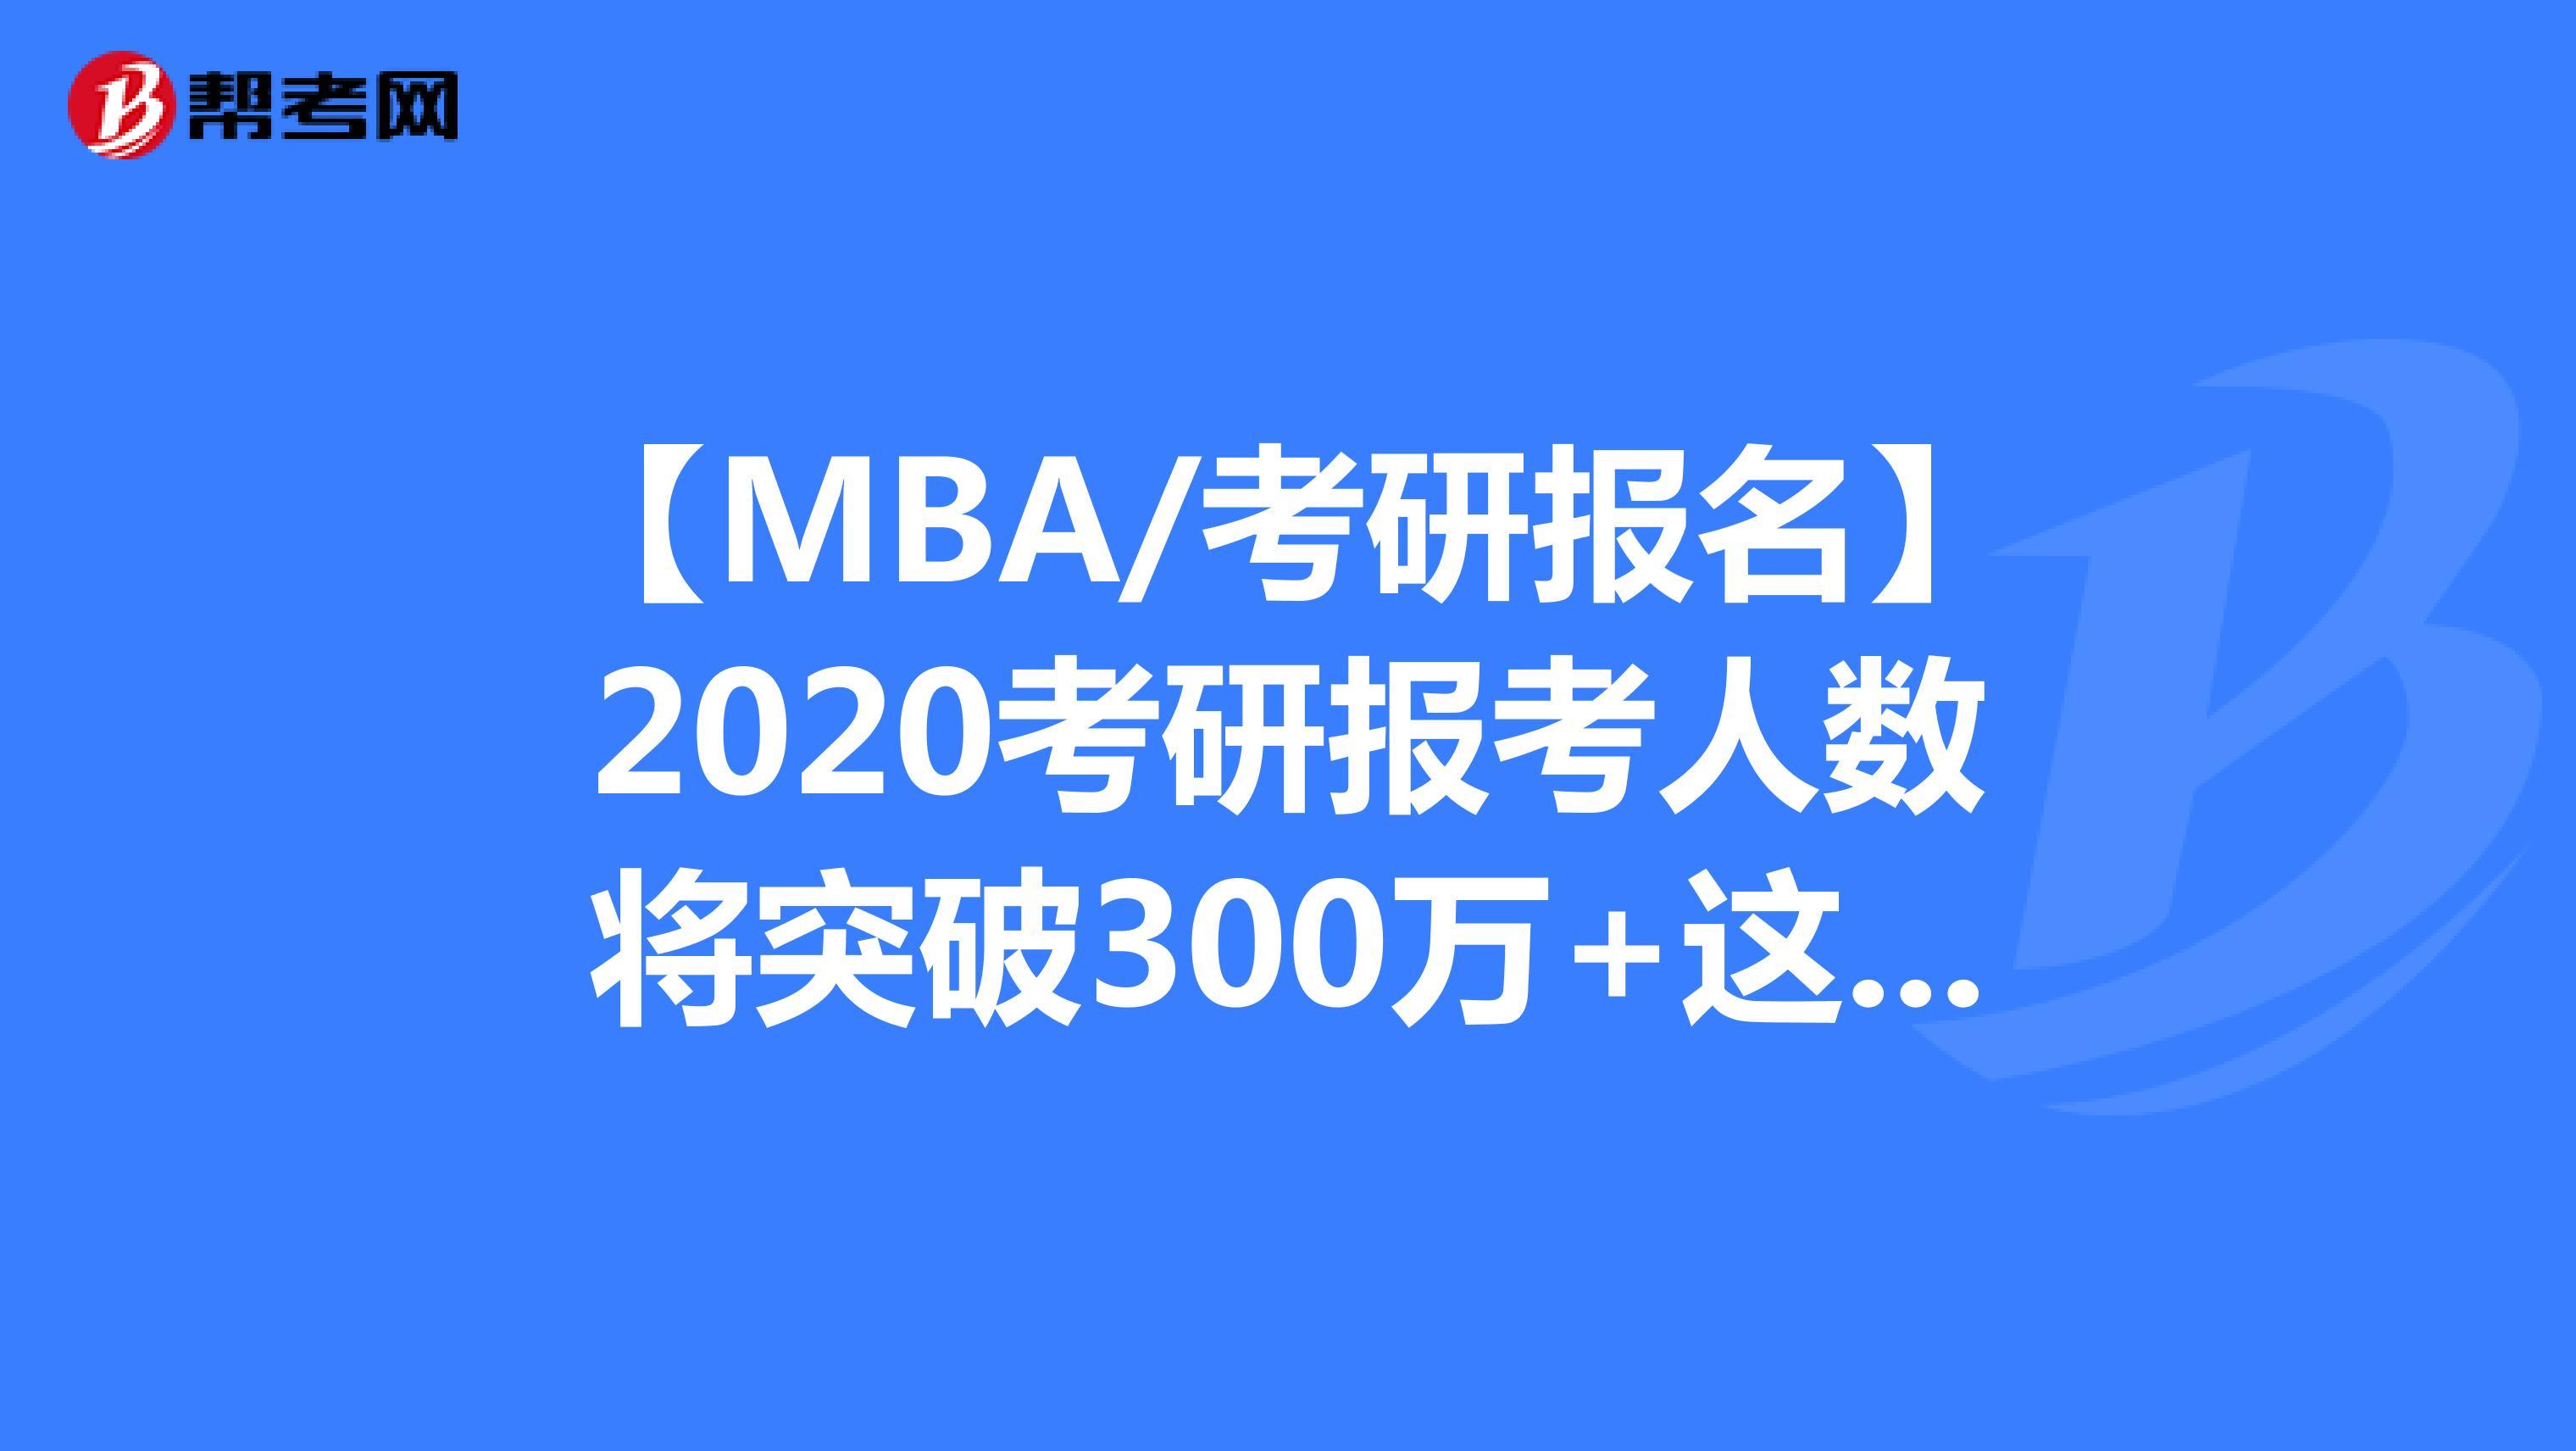 【MBA/考研报名】2020考研报考人数将突破300万+这些数据你了解吗?